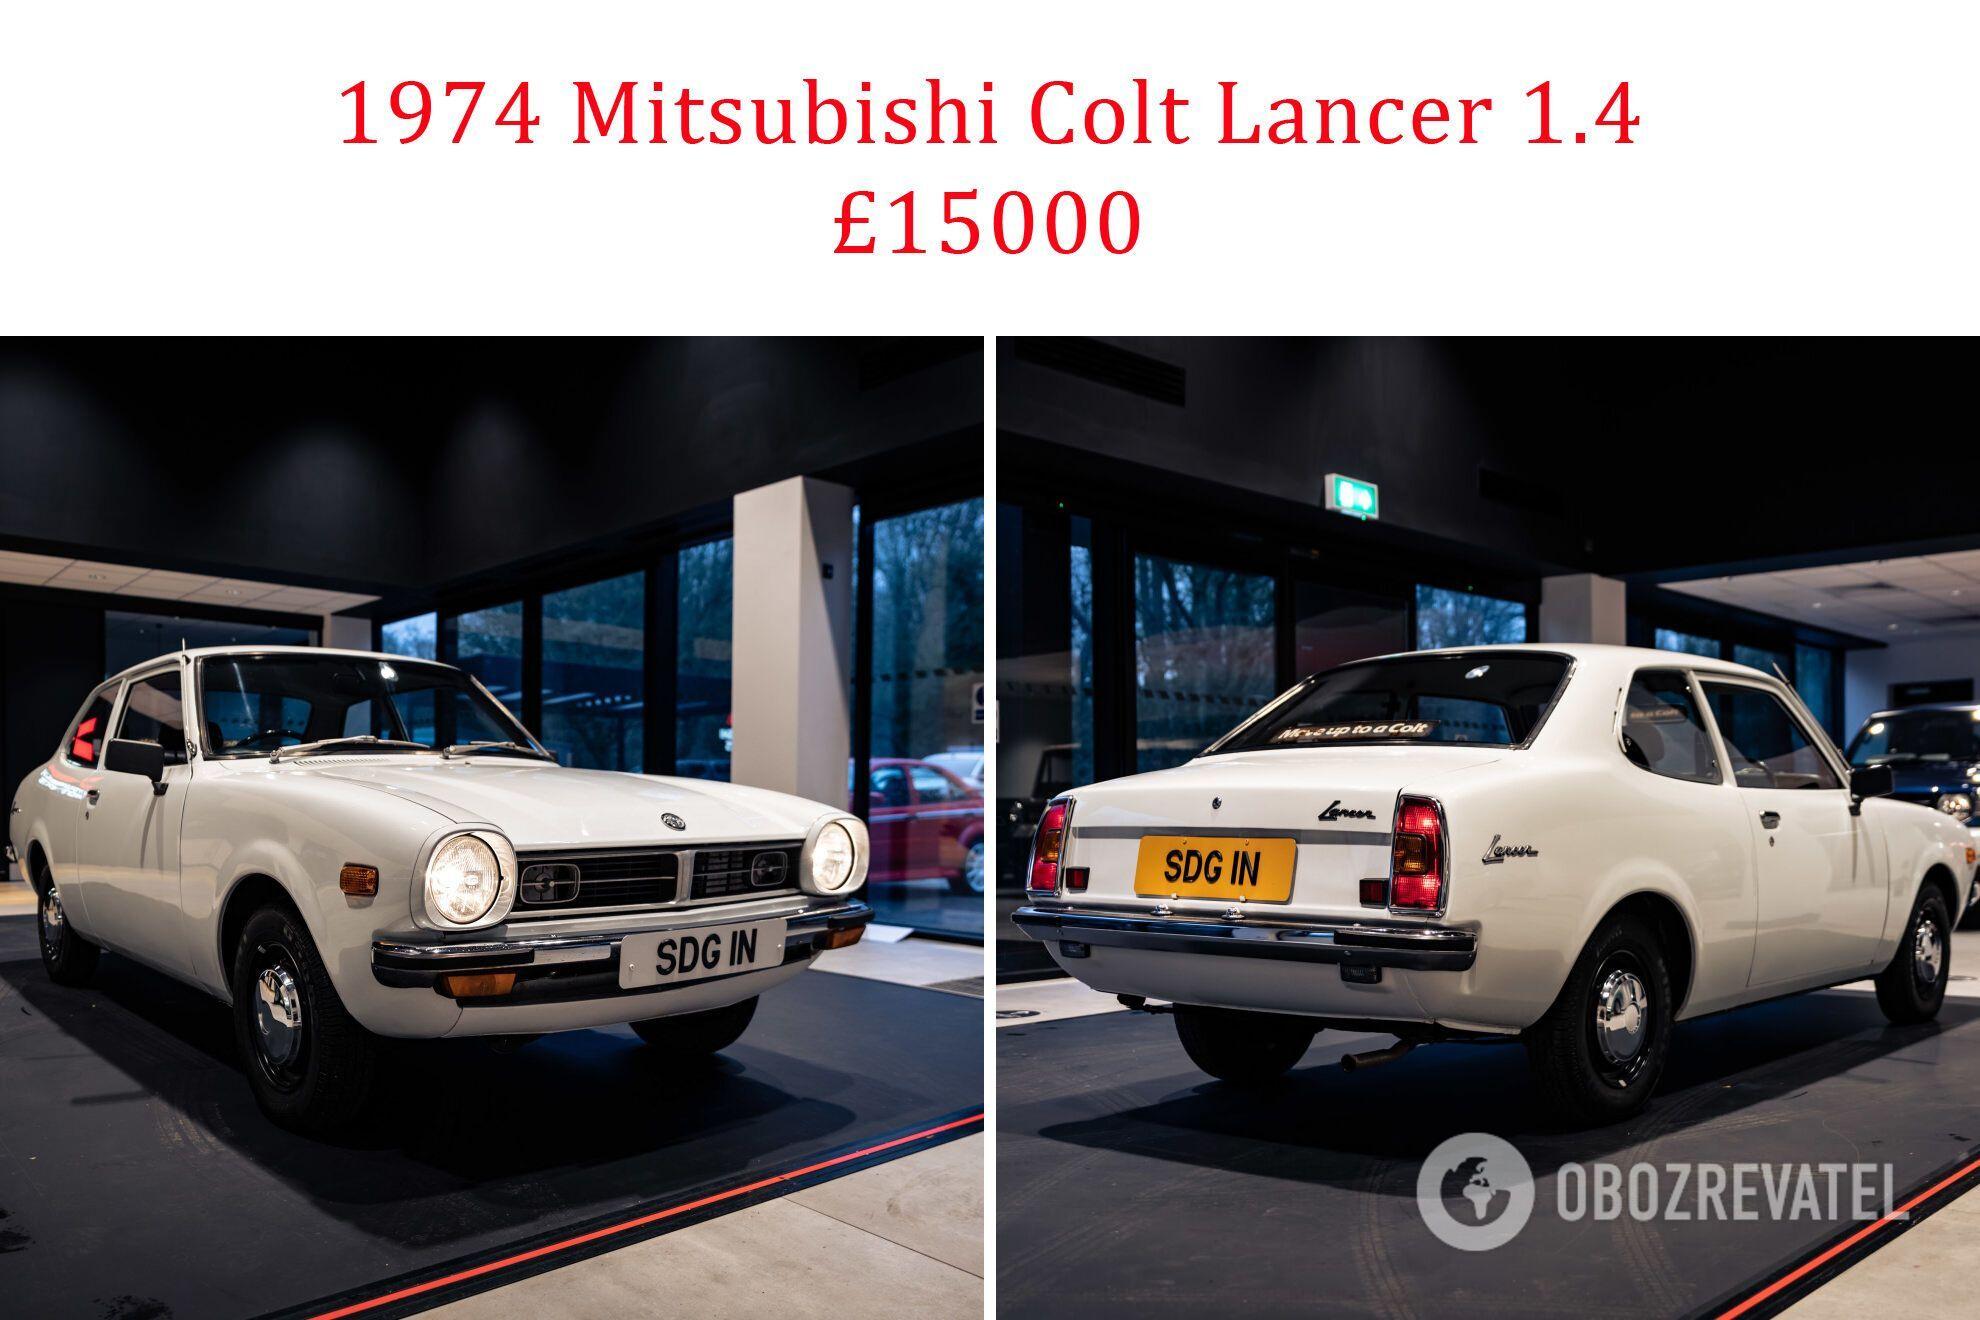 1974 Mitsubishi Colt Lancer 1.4